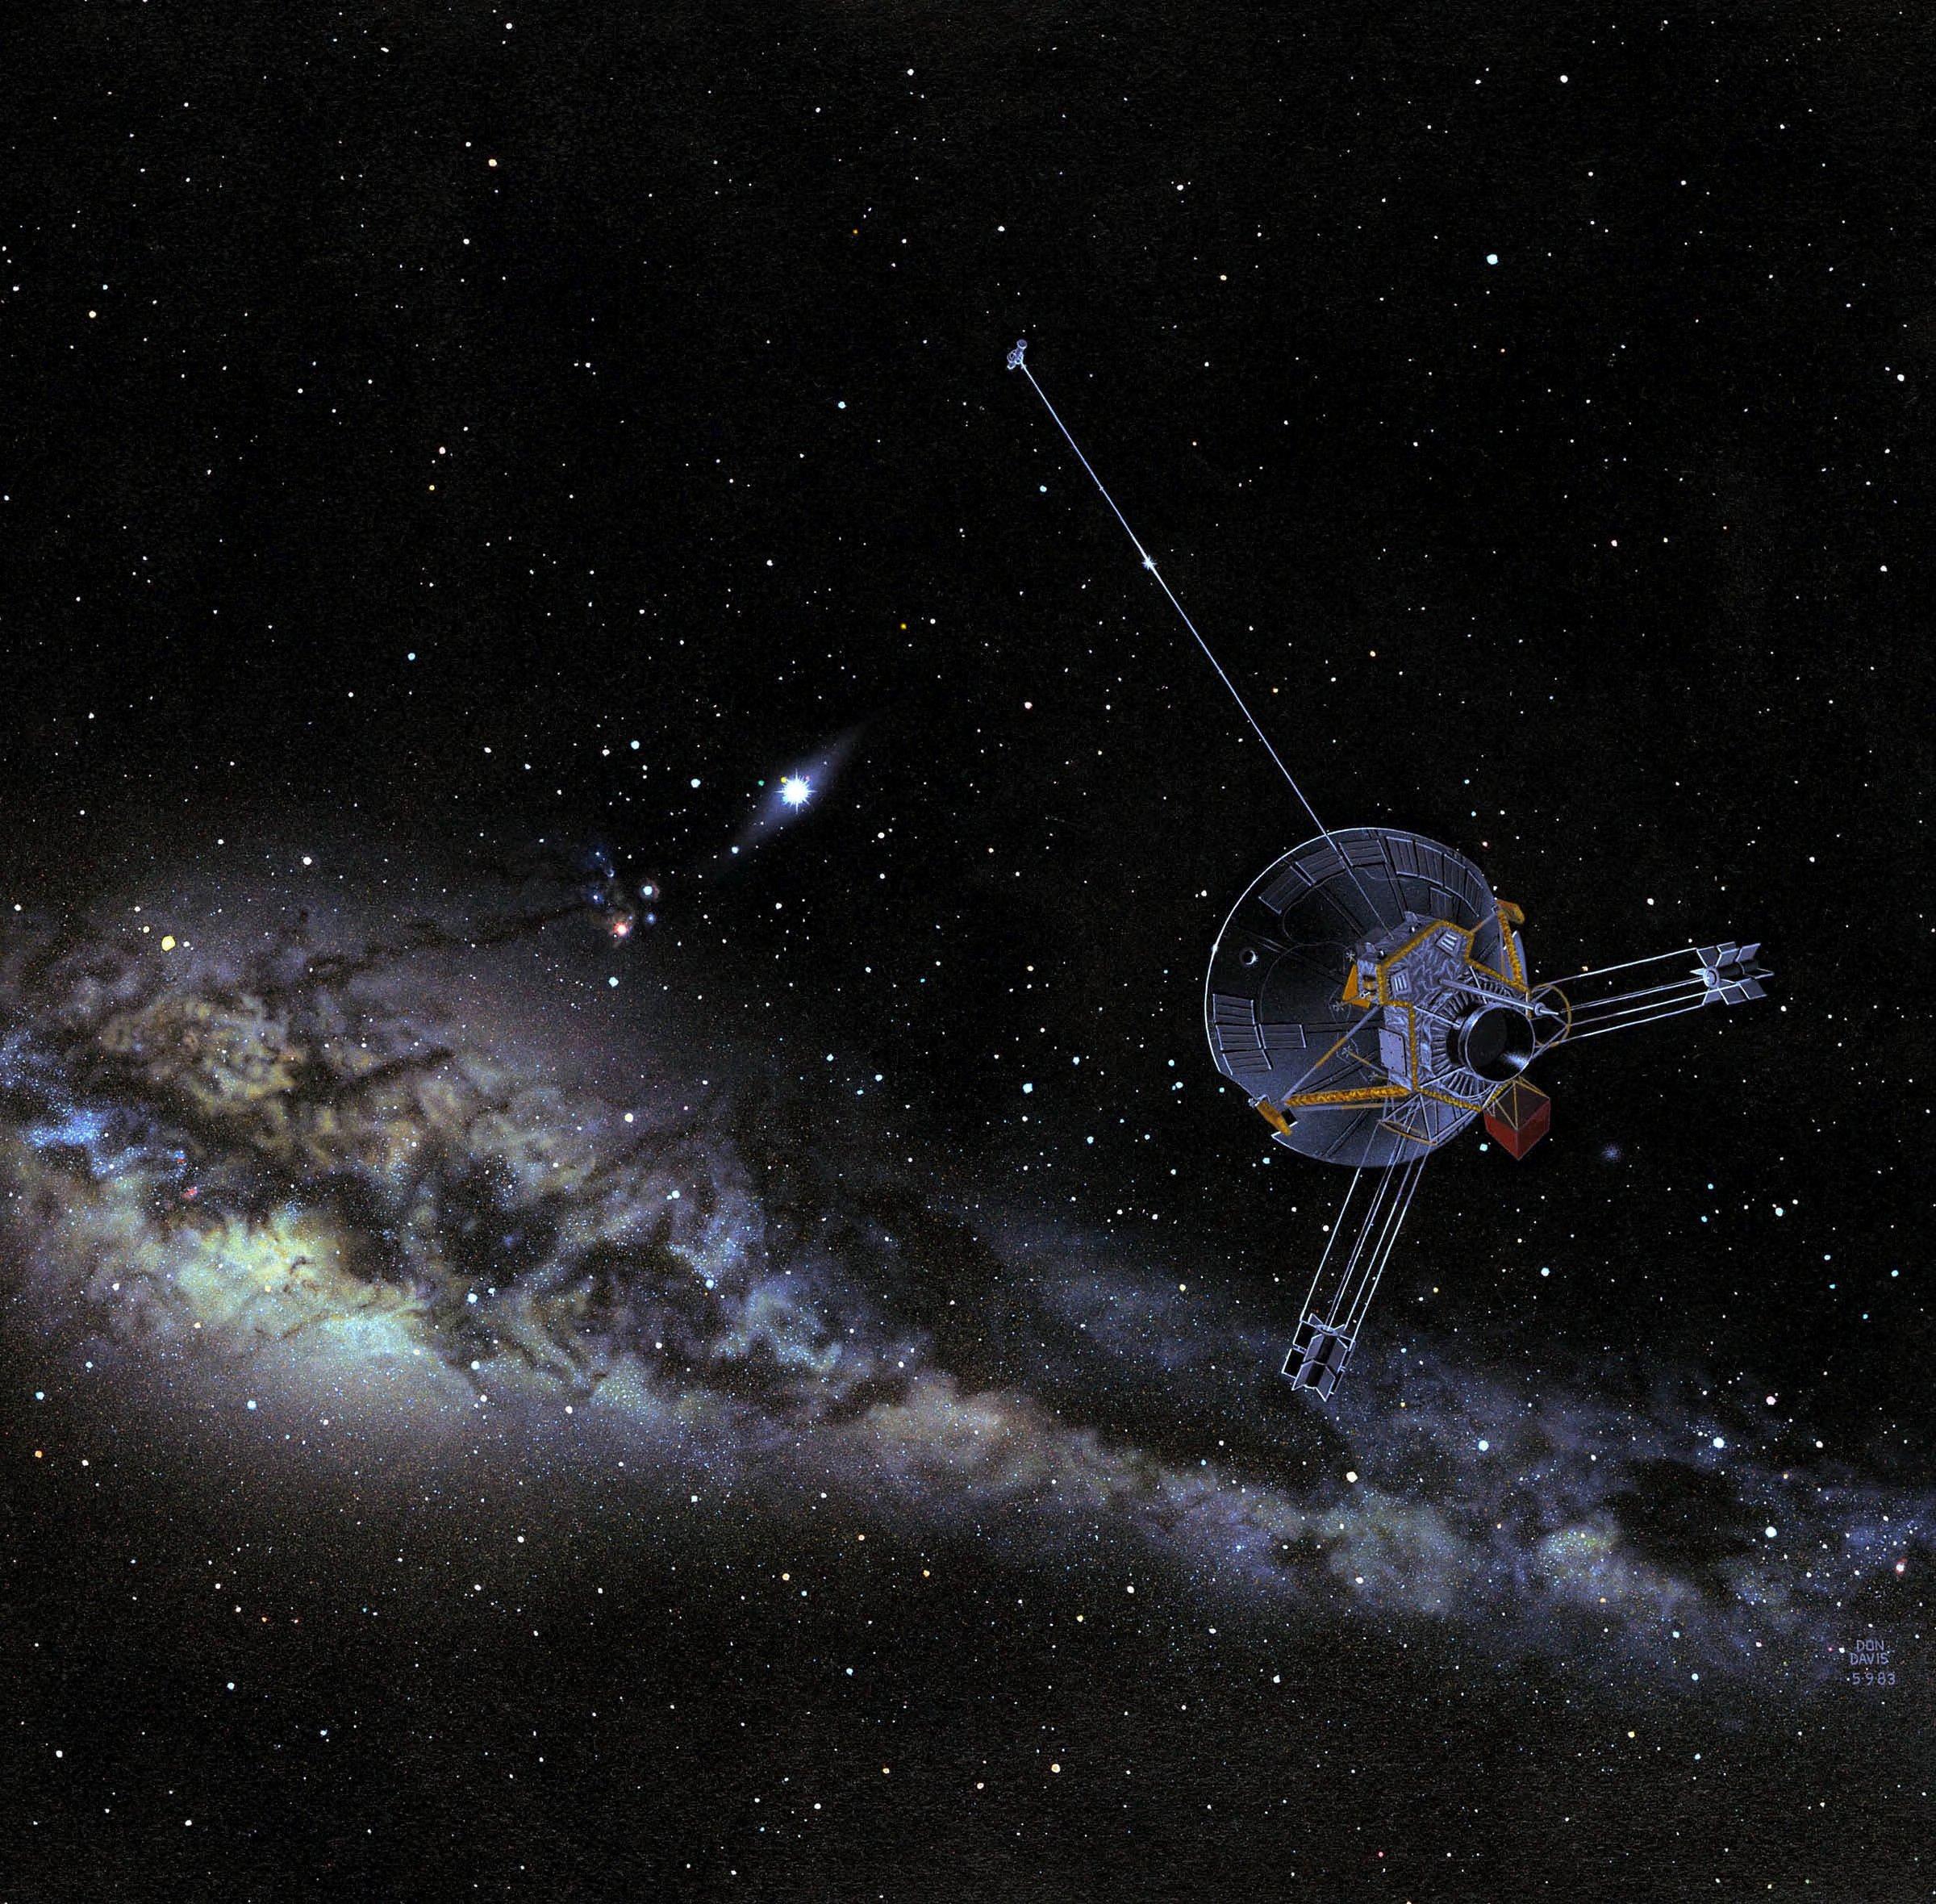 Ostatni sygnał Pioneera 10